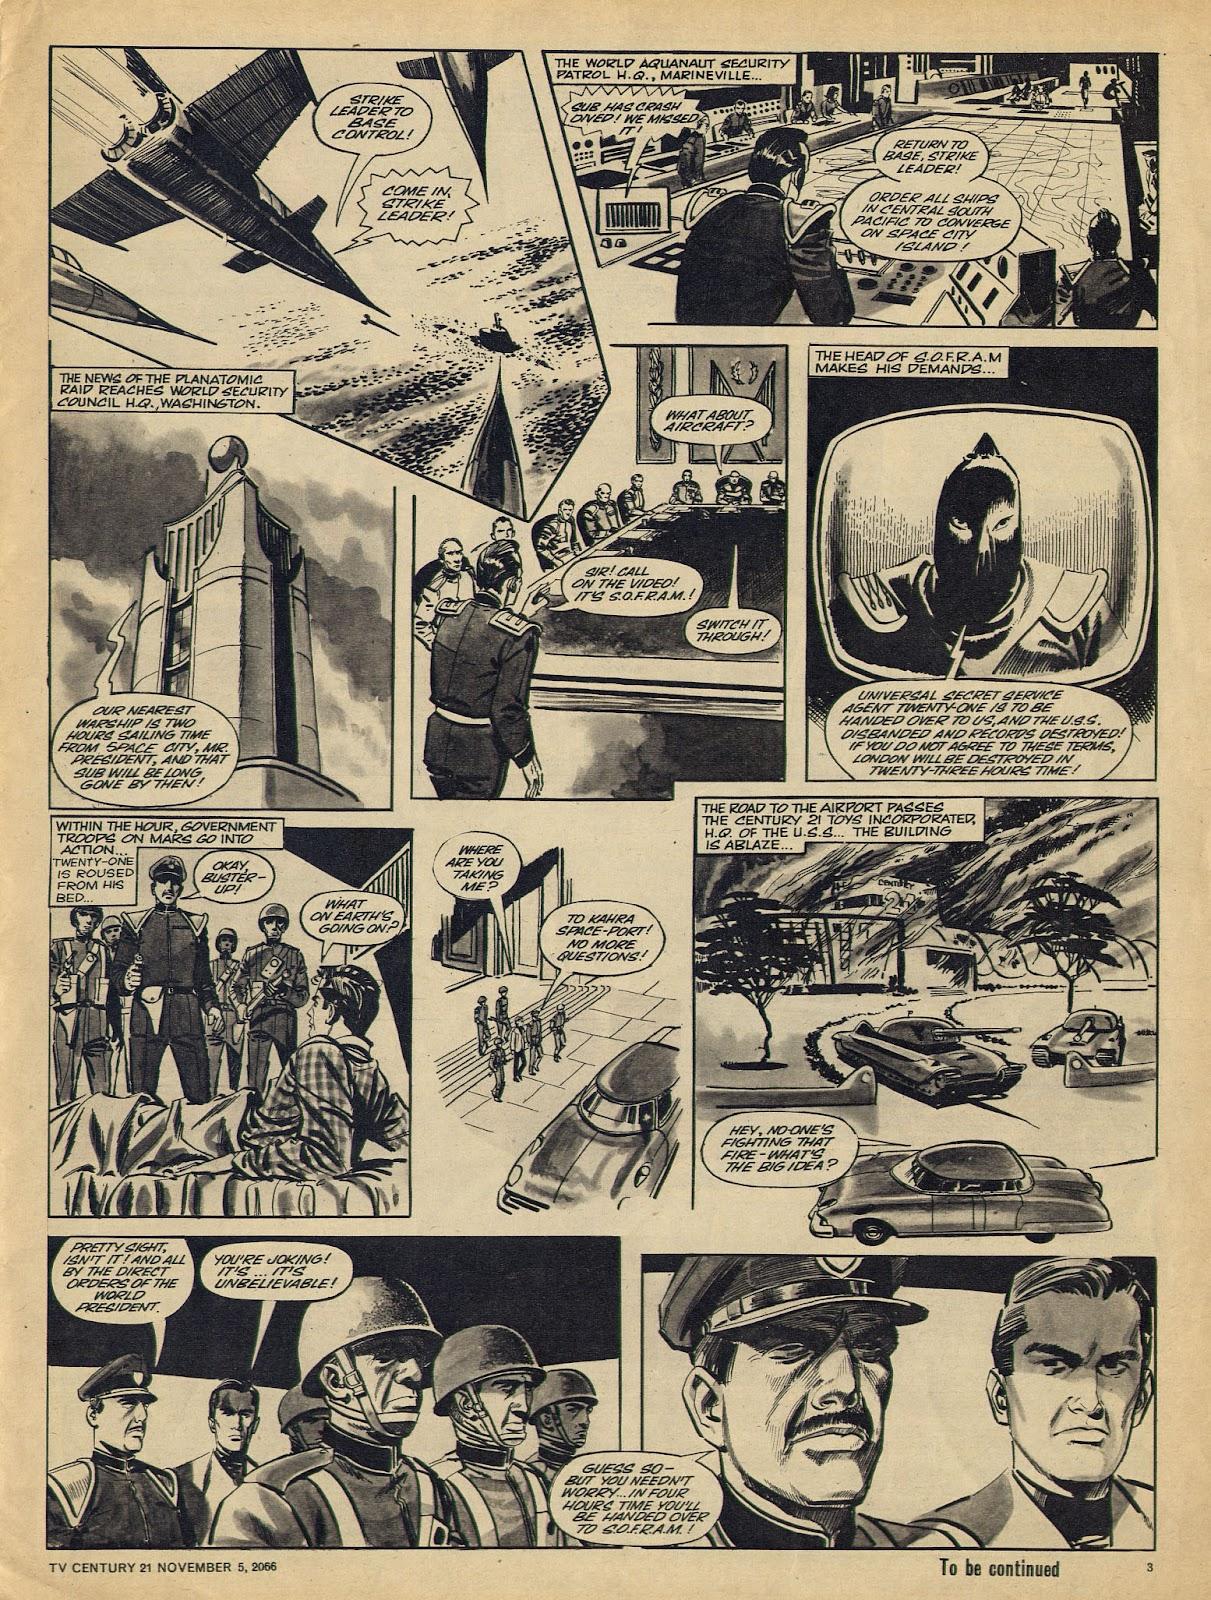 TV Century 21 (TV 21) issue 94 - Page 3